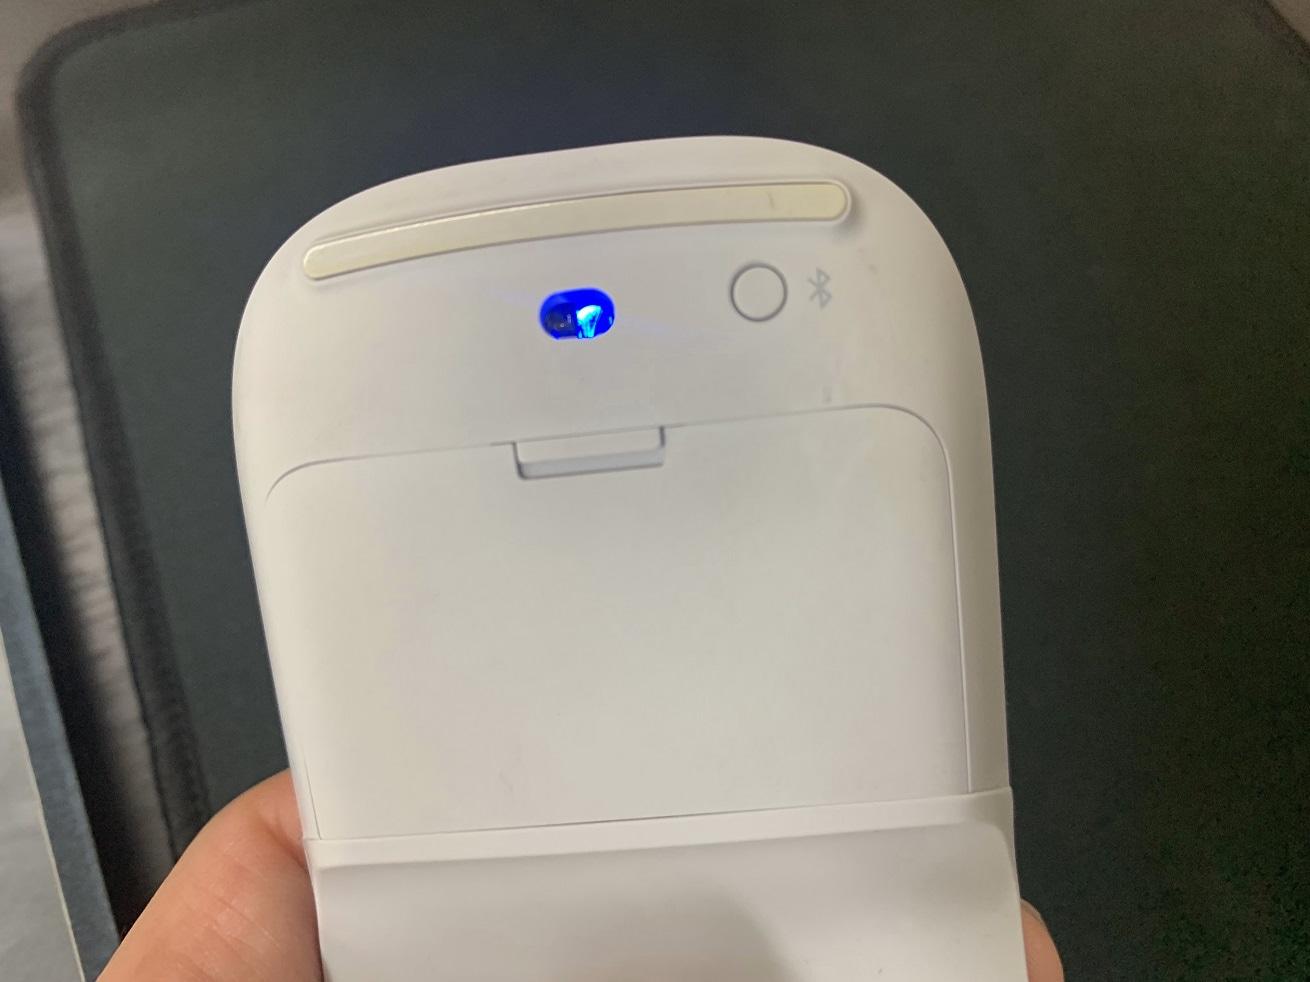 Microsoft Surface Arc Mouse裏側青色LED点灯で電源ON状態